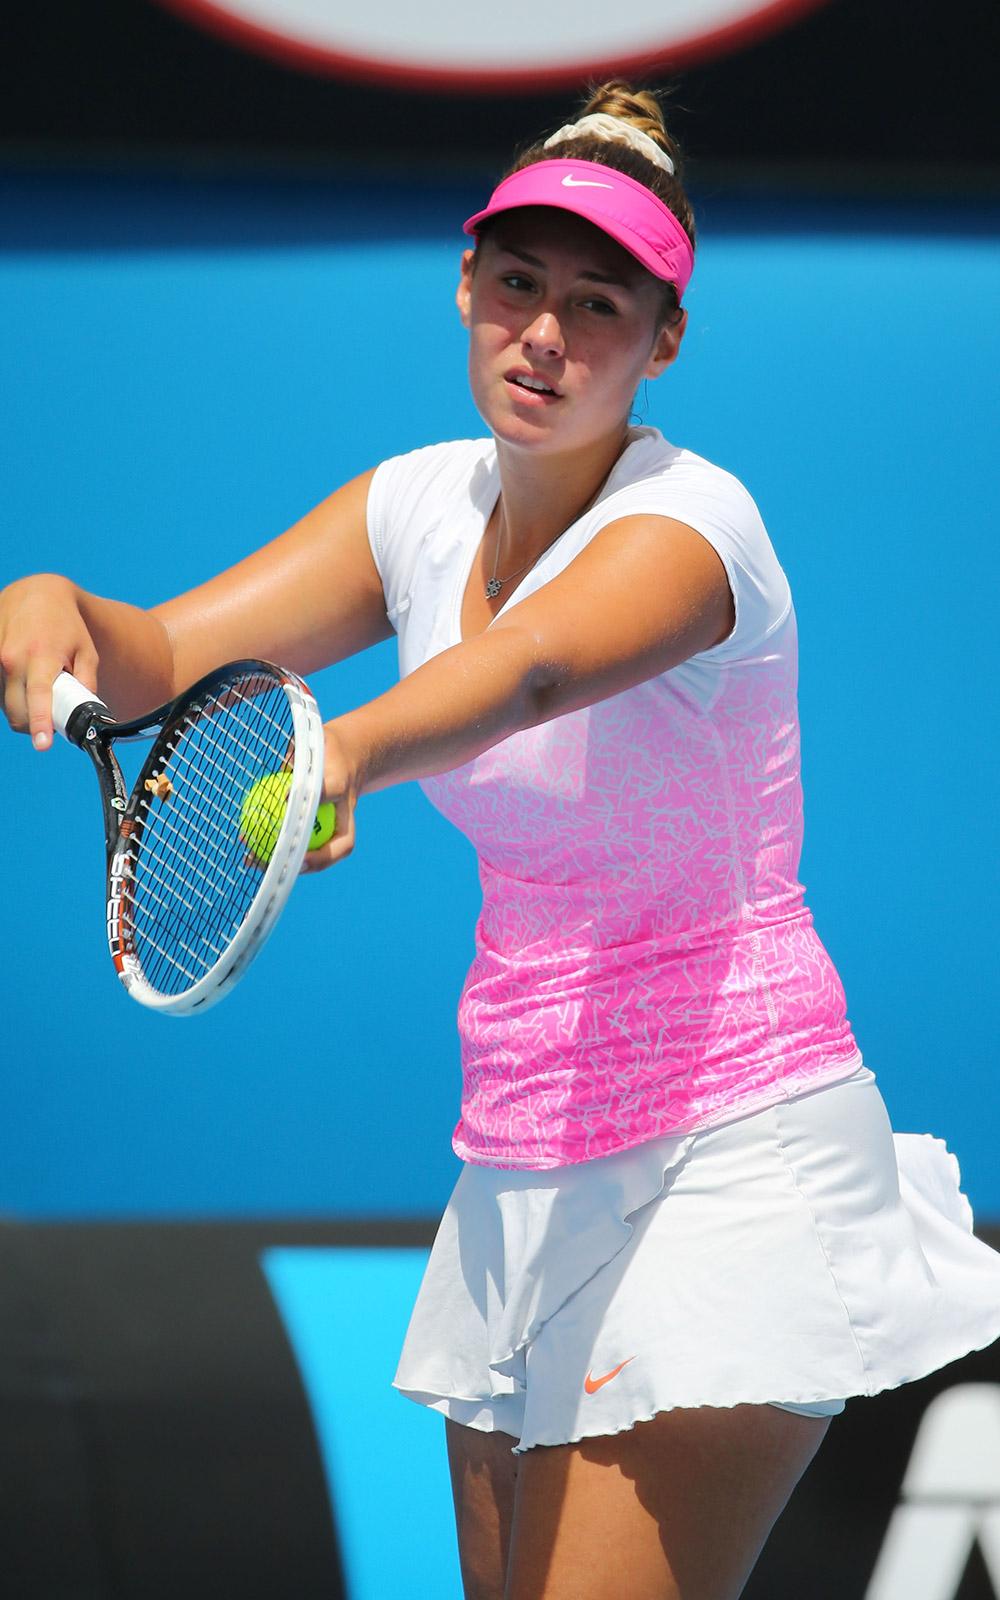 Sara Tomic Player Profiles Players And Rankings News